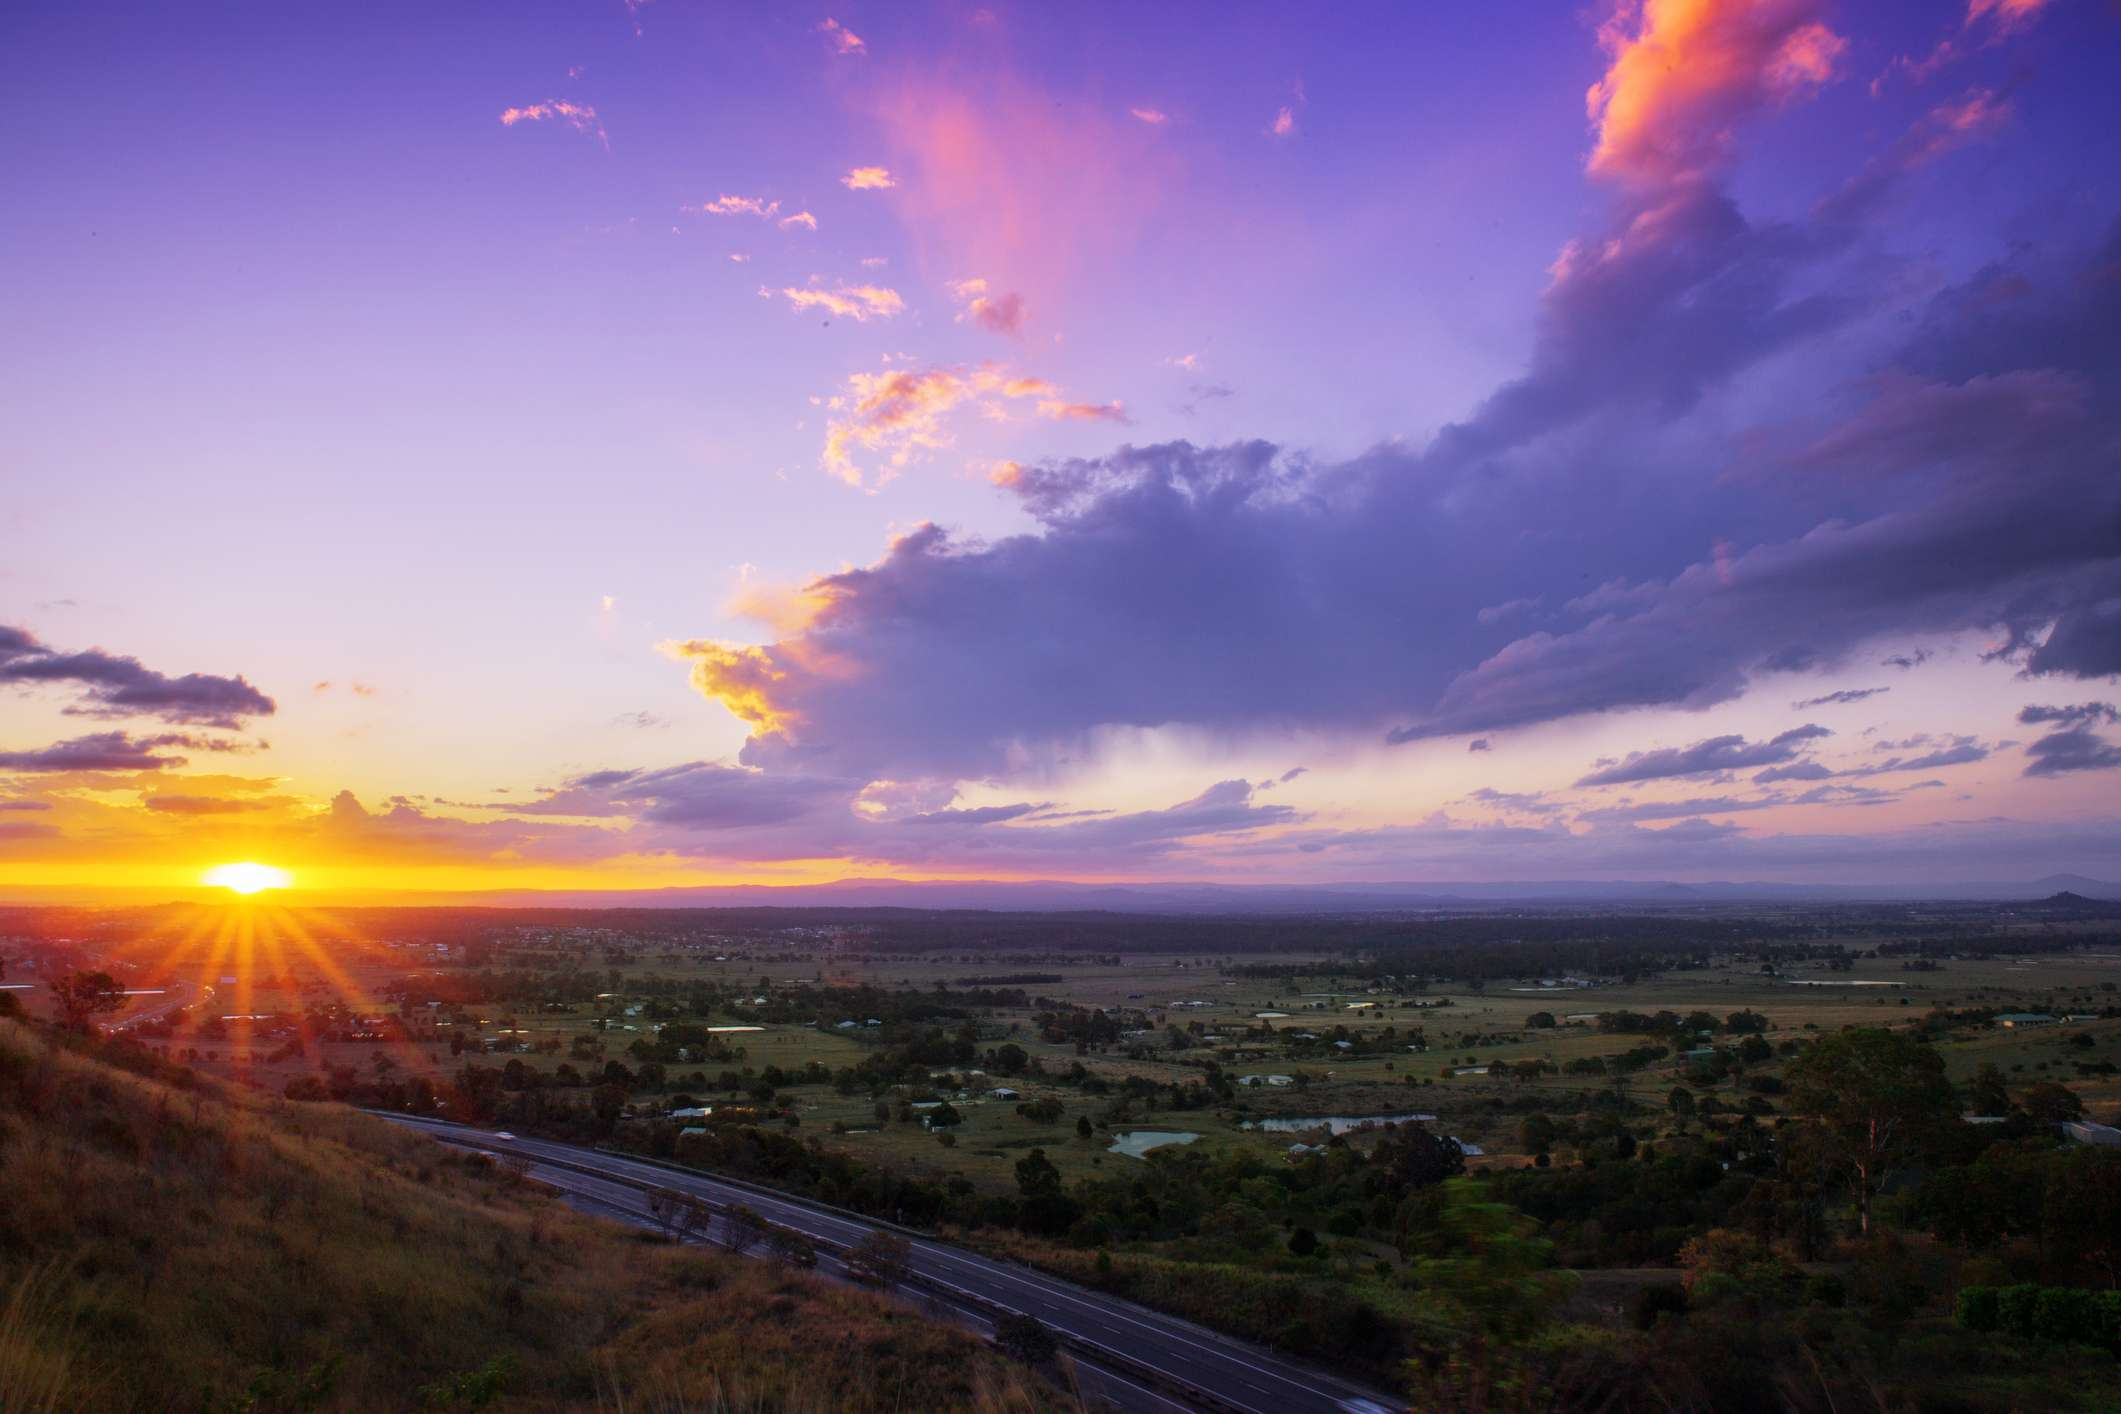 Purple tinged sunset over Lockyear Valley